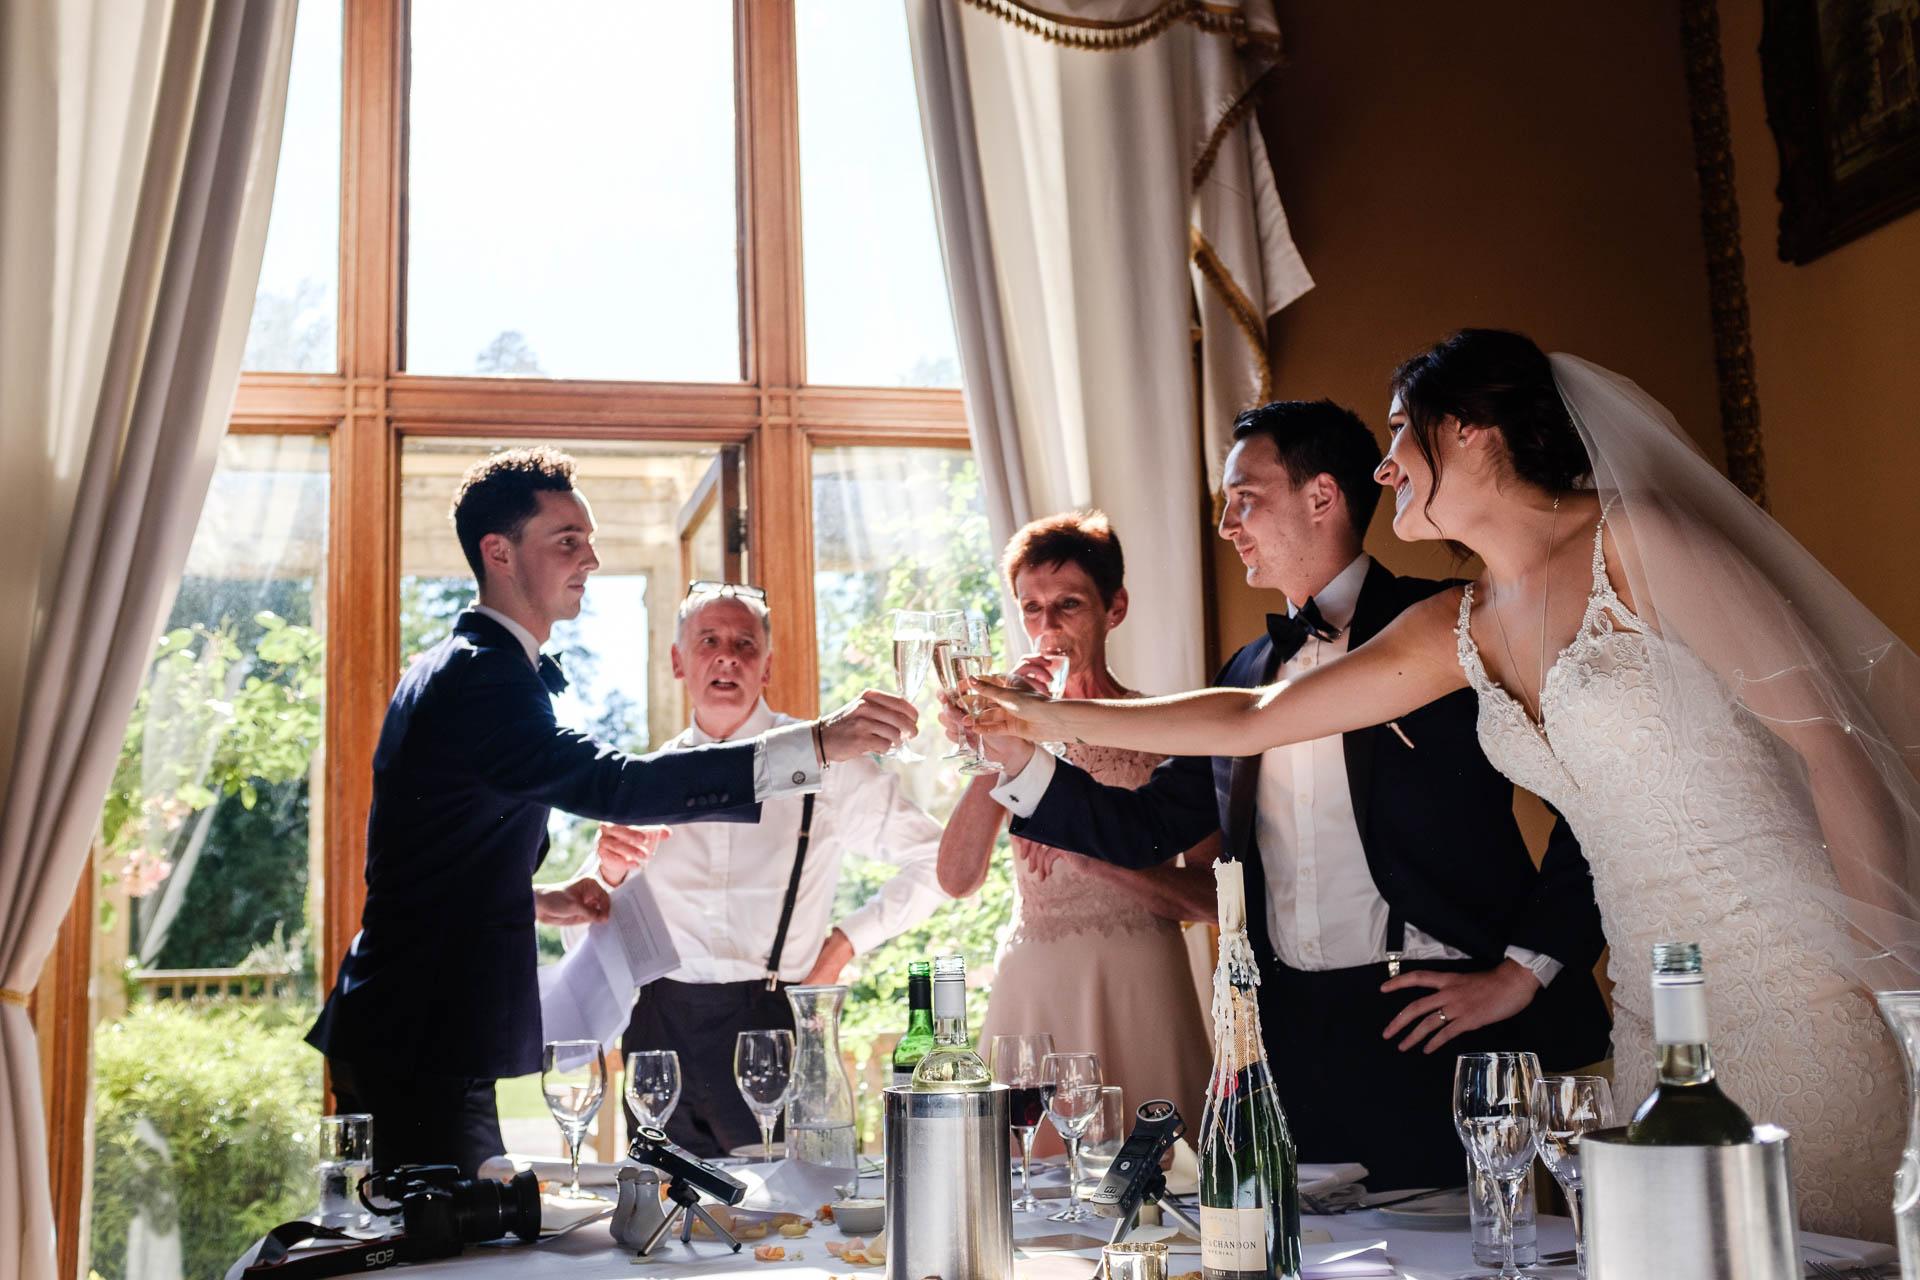 orchardleigh house wedding - Danni & Barney (362).jpg